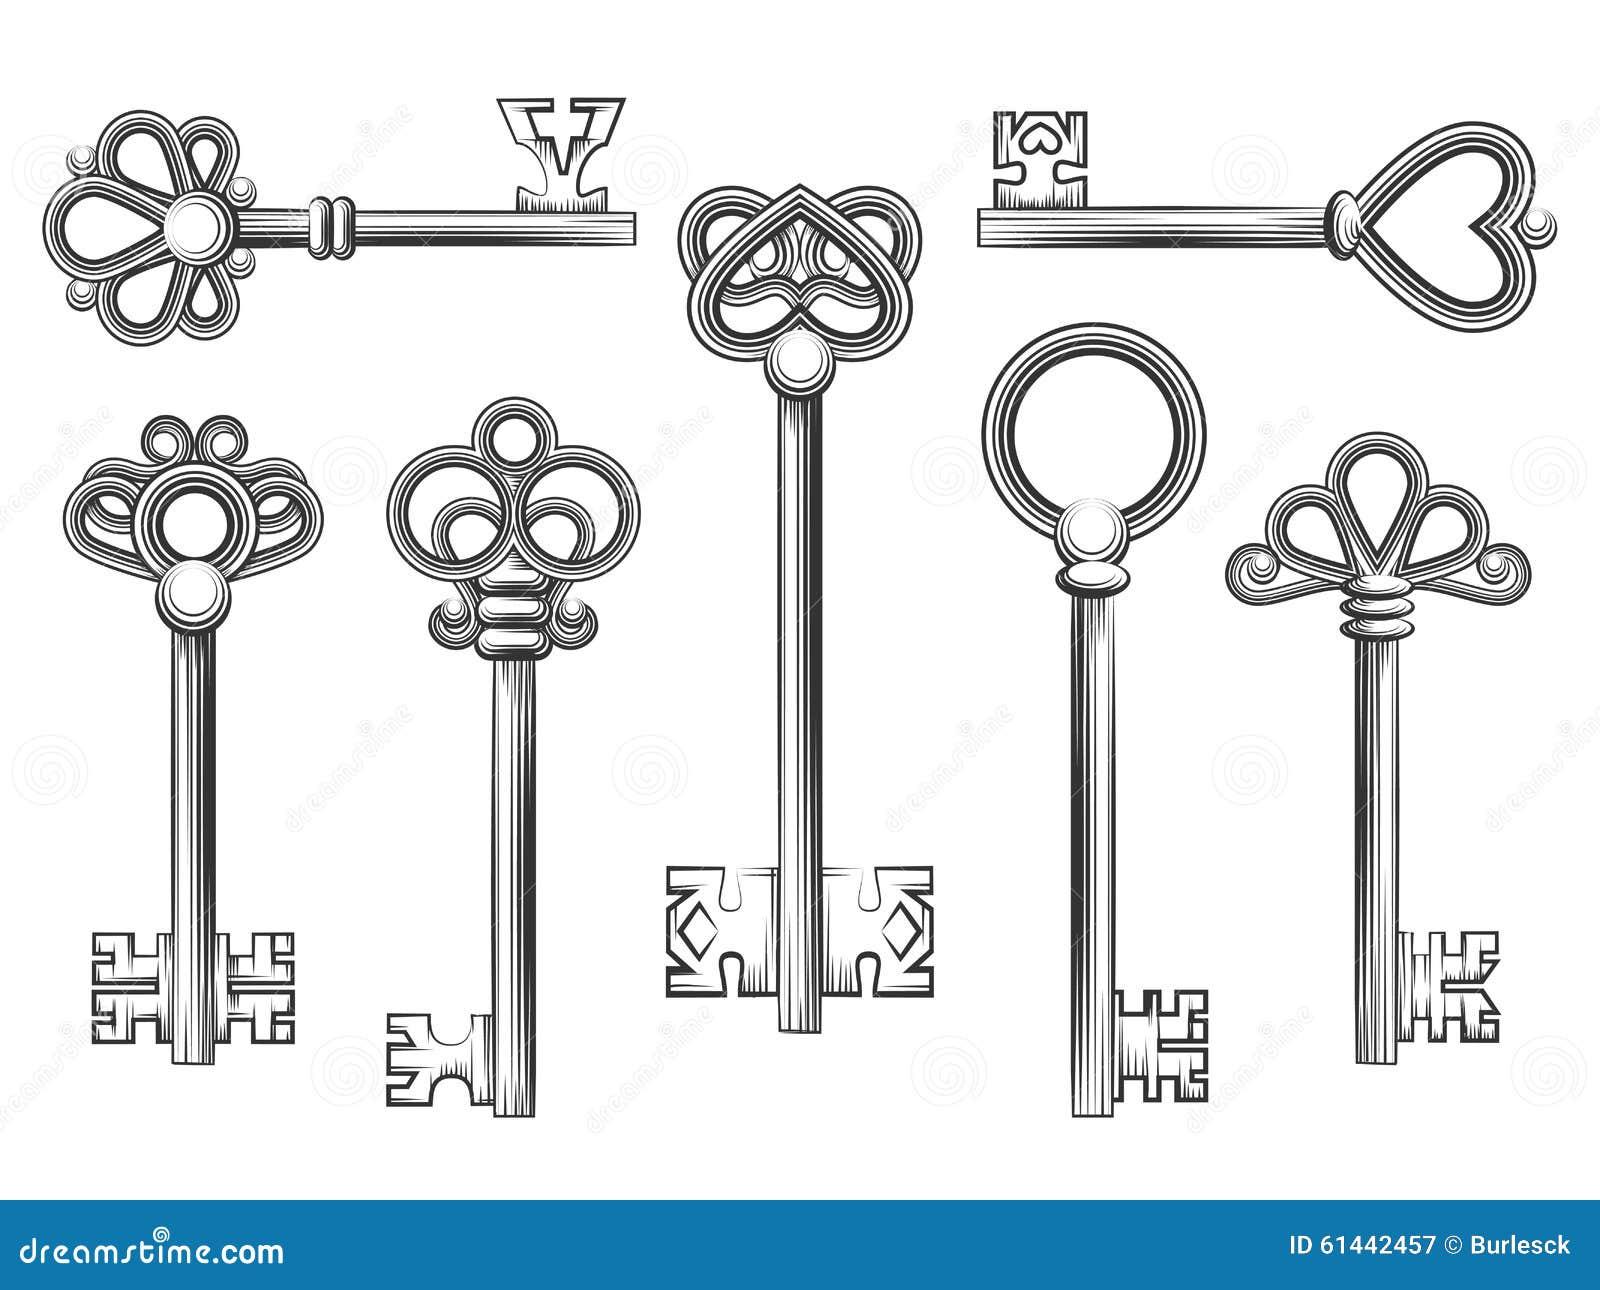 Vector Key Illustration: Vintage Key Vector Set In Engraving Style Stock Vector